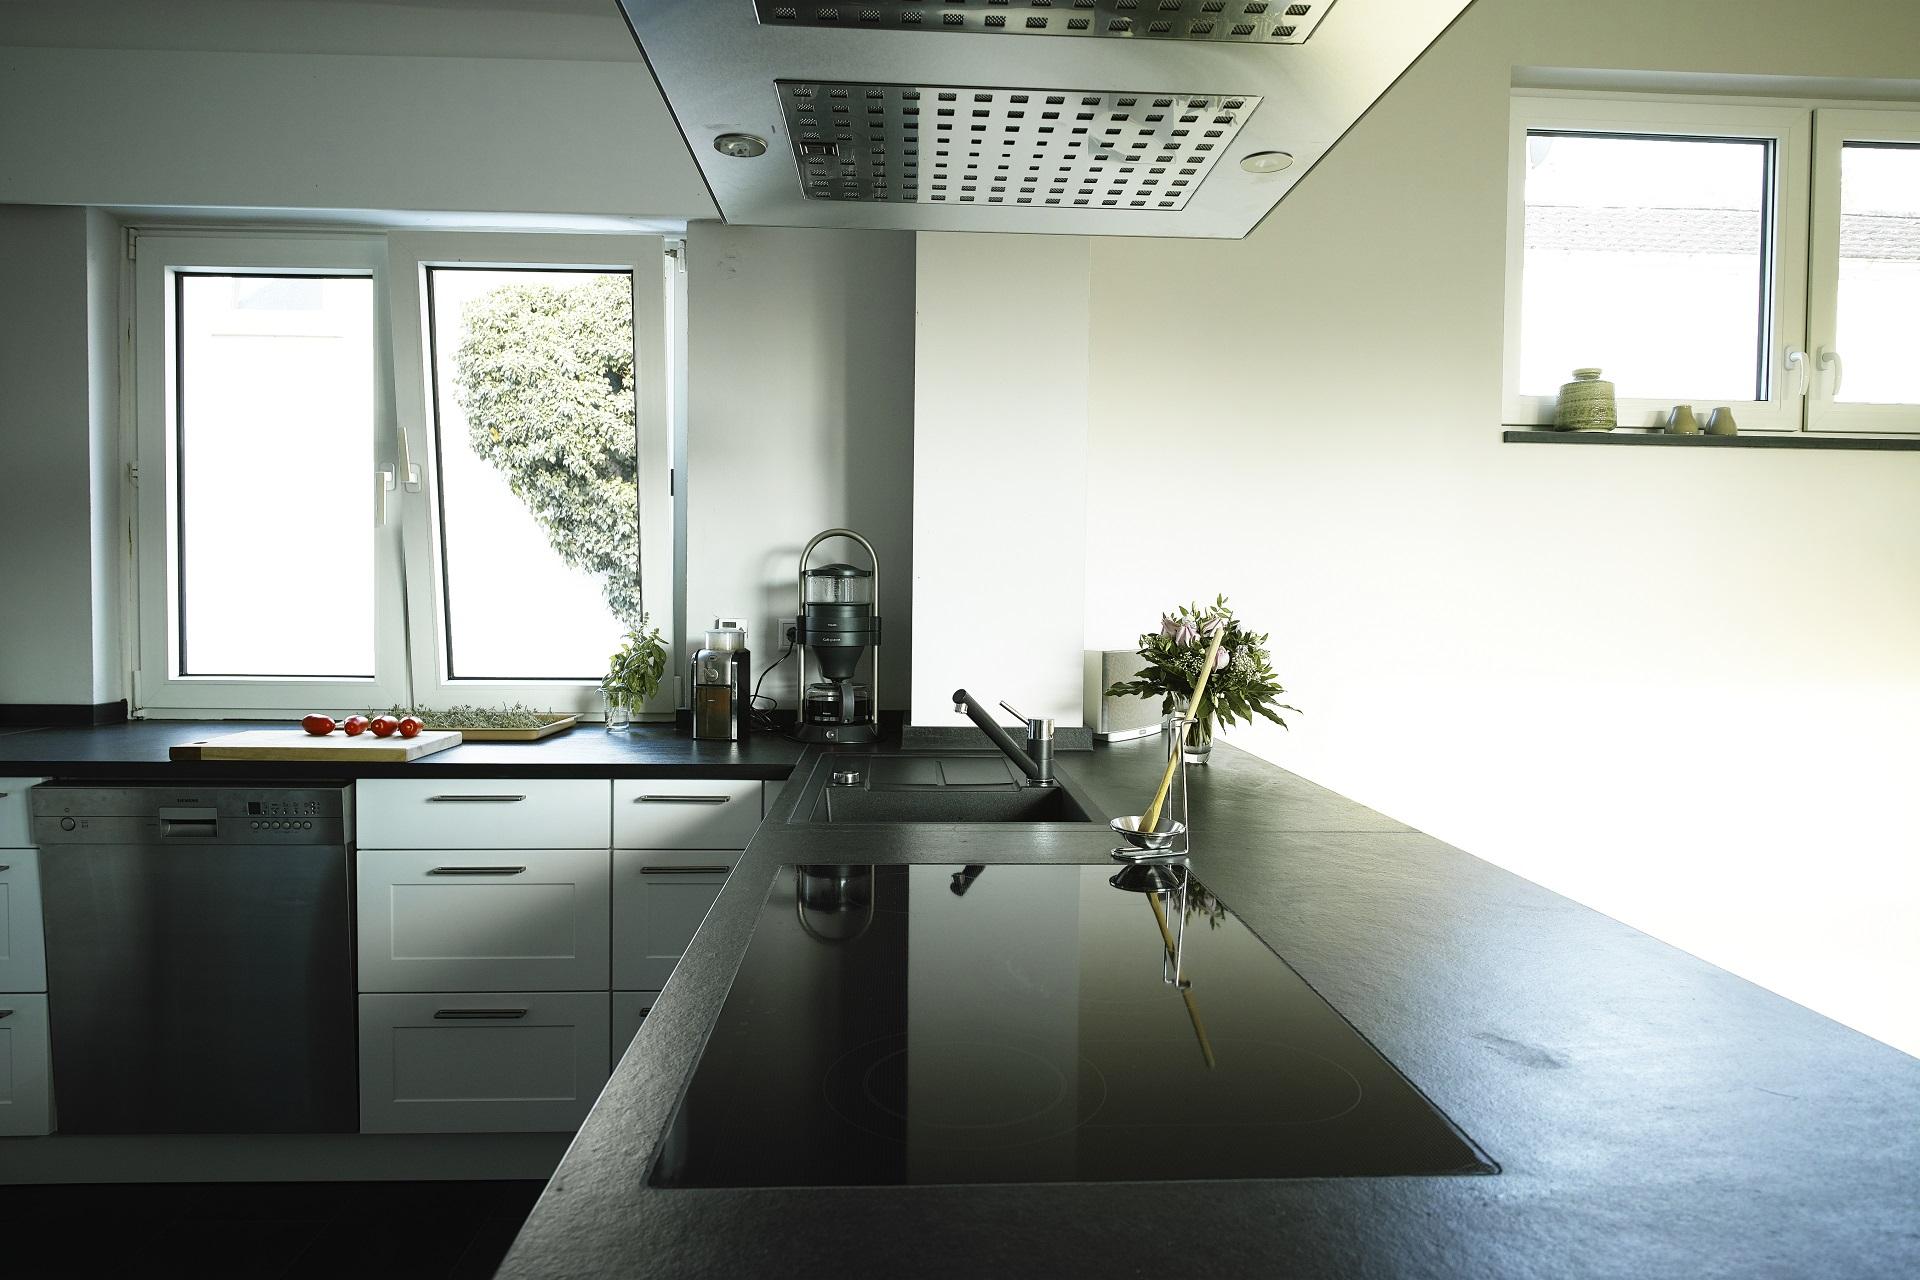 Full Size of Java Schiefer Arbeitsplatte Kchenarbeitsplatte Aus Küche Sideboard Mit Arbeitsplatten Wohnzimmer Java Schiefer Arbeitsplatte